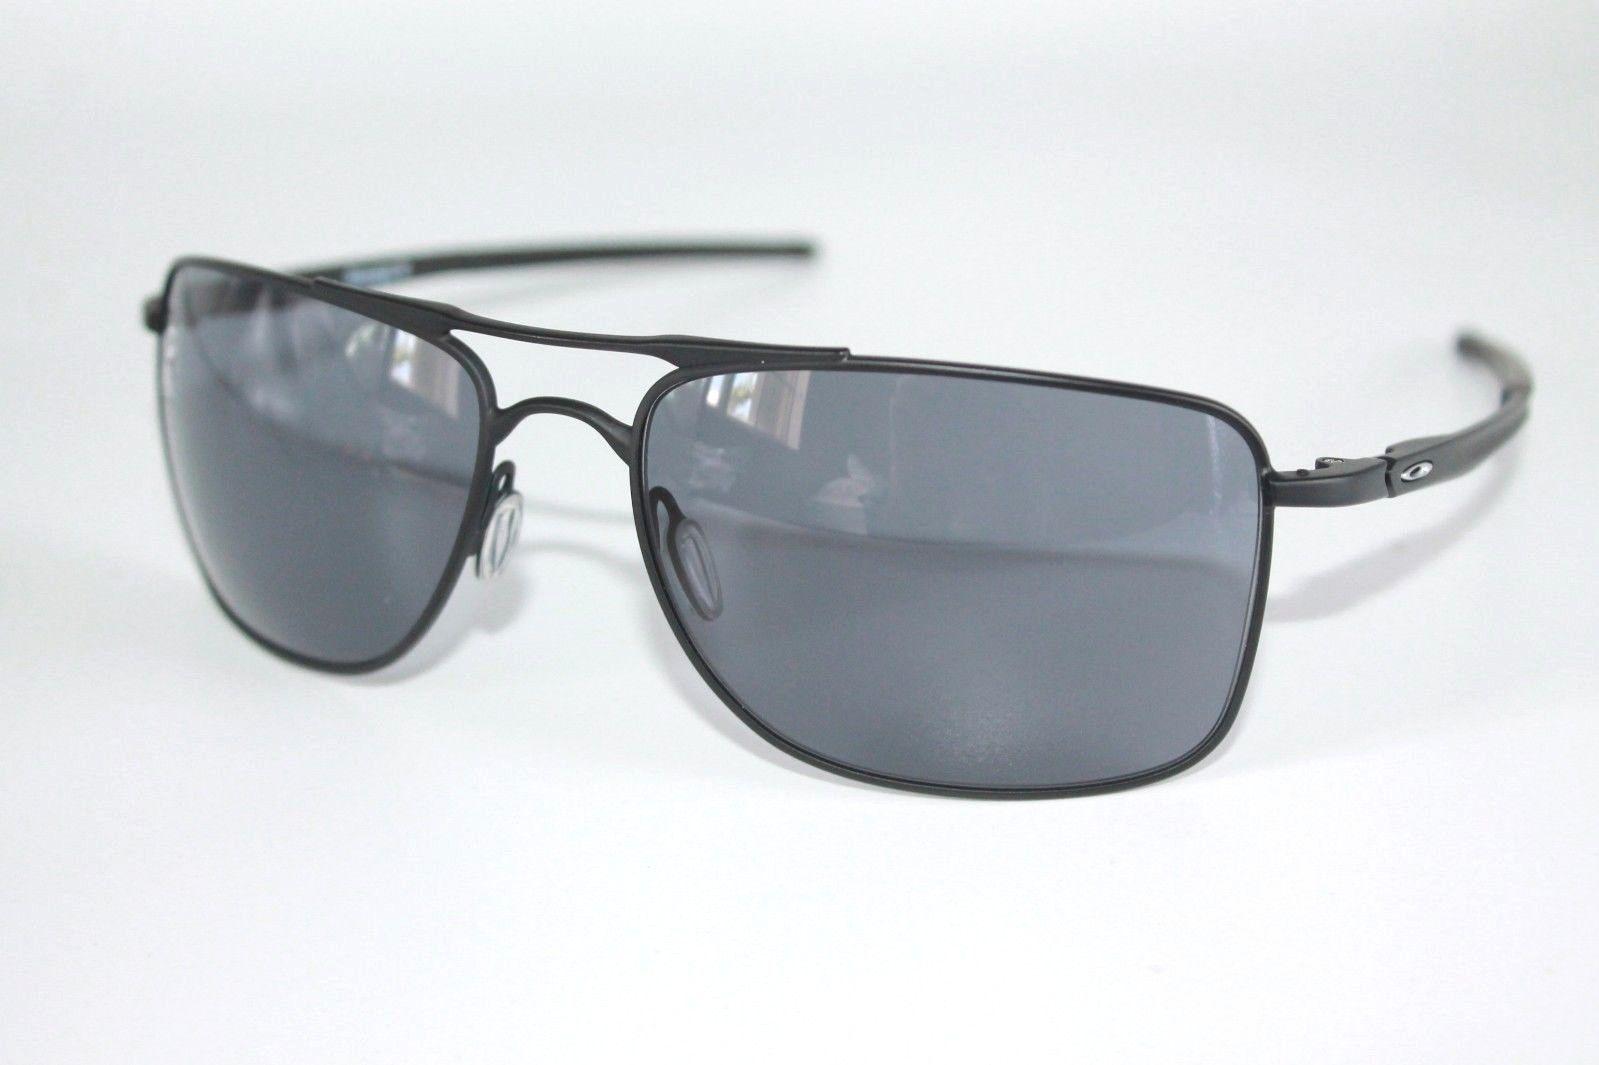 Oakley Gauge 8 Sunglasses OO4124-01 Matte Black Frame W/ Grey Lens